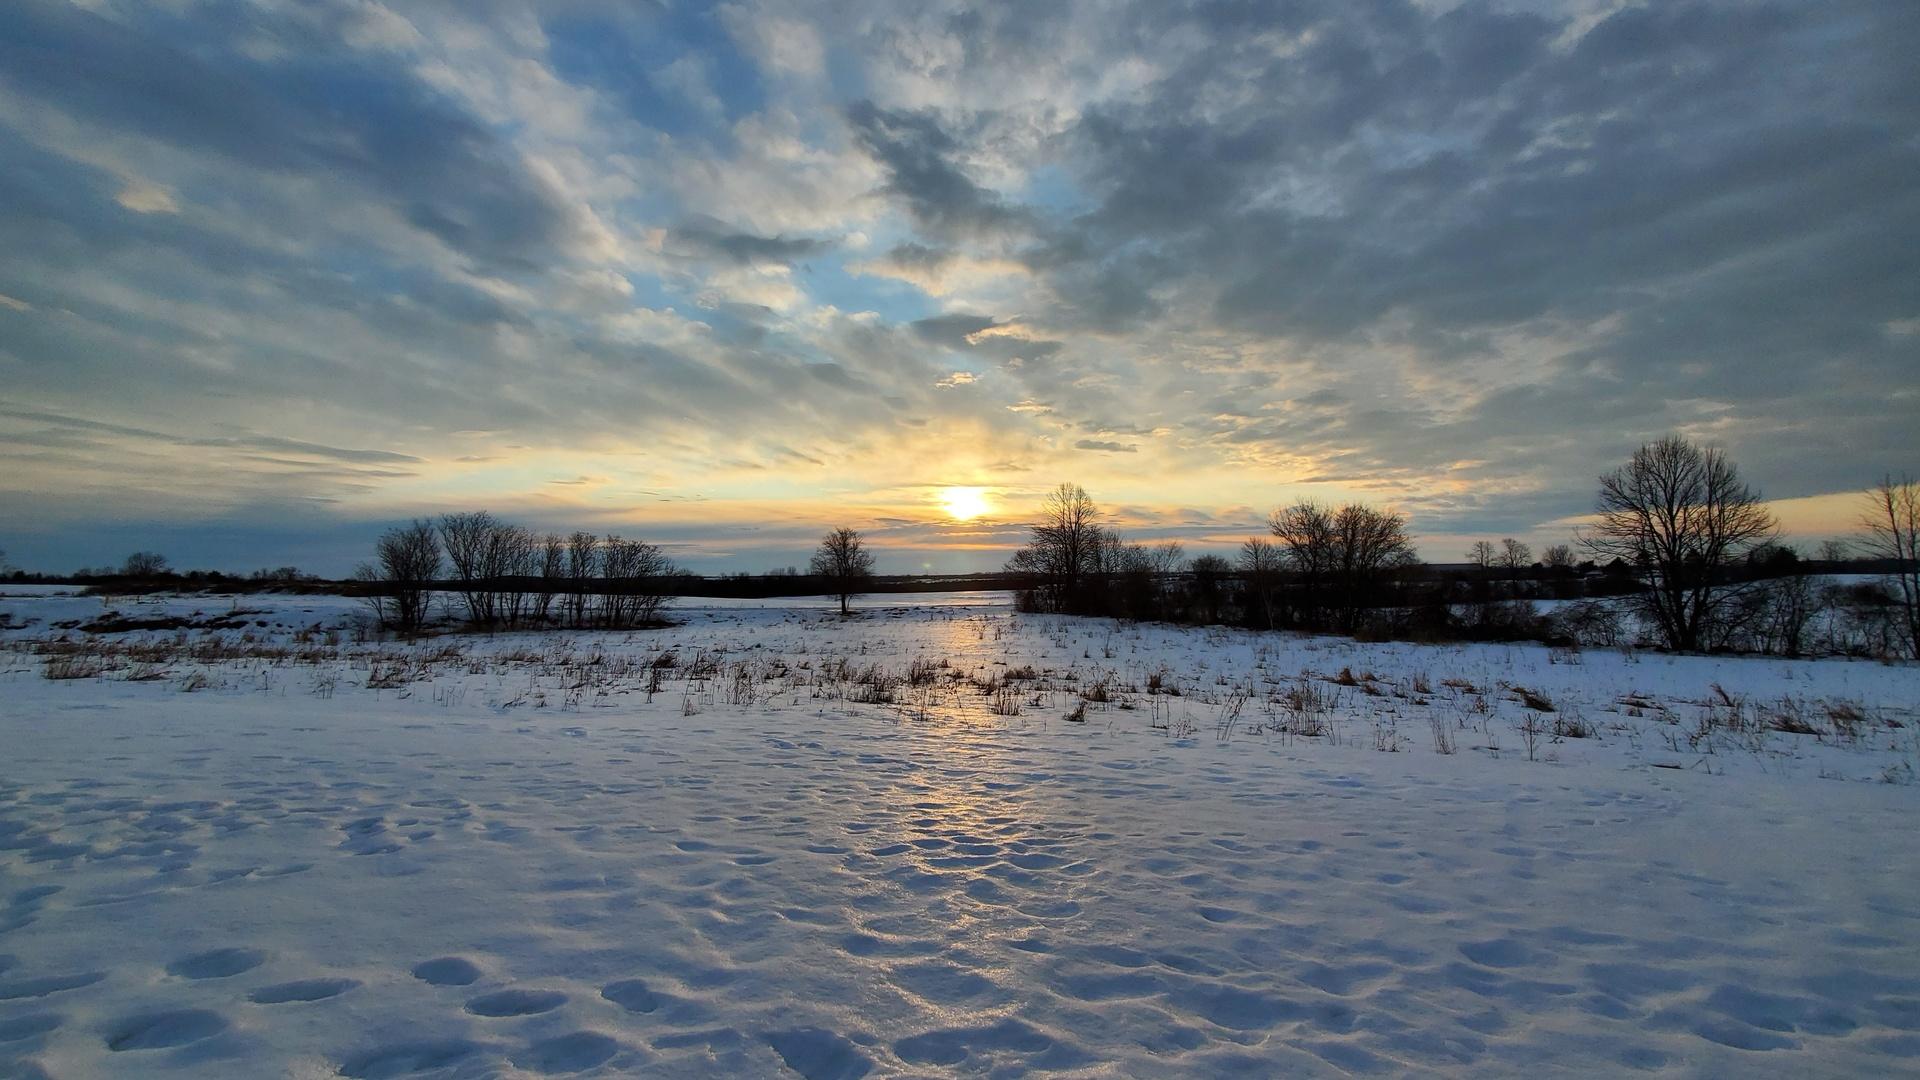 зима, снег, пейзаж, восход